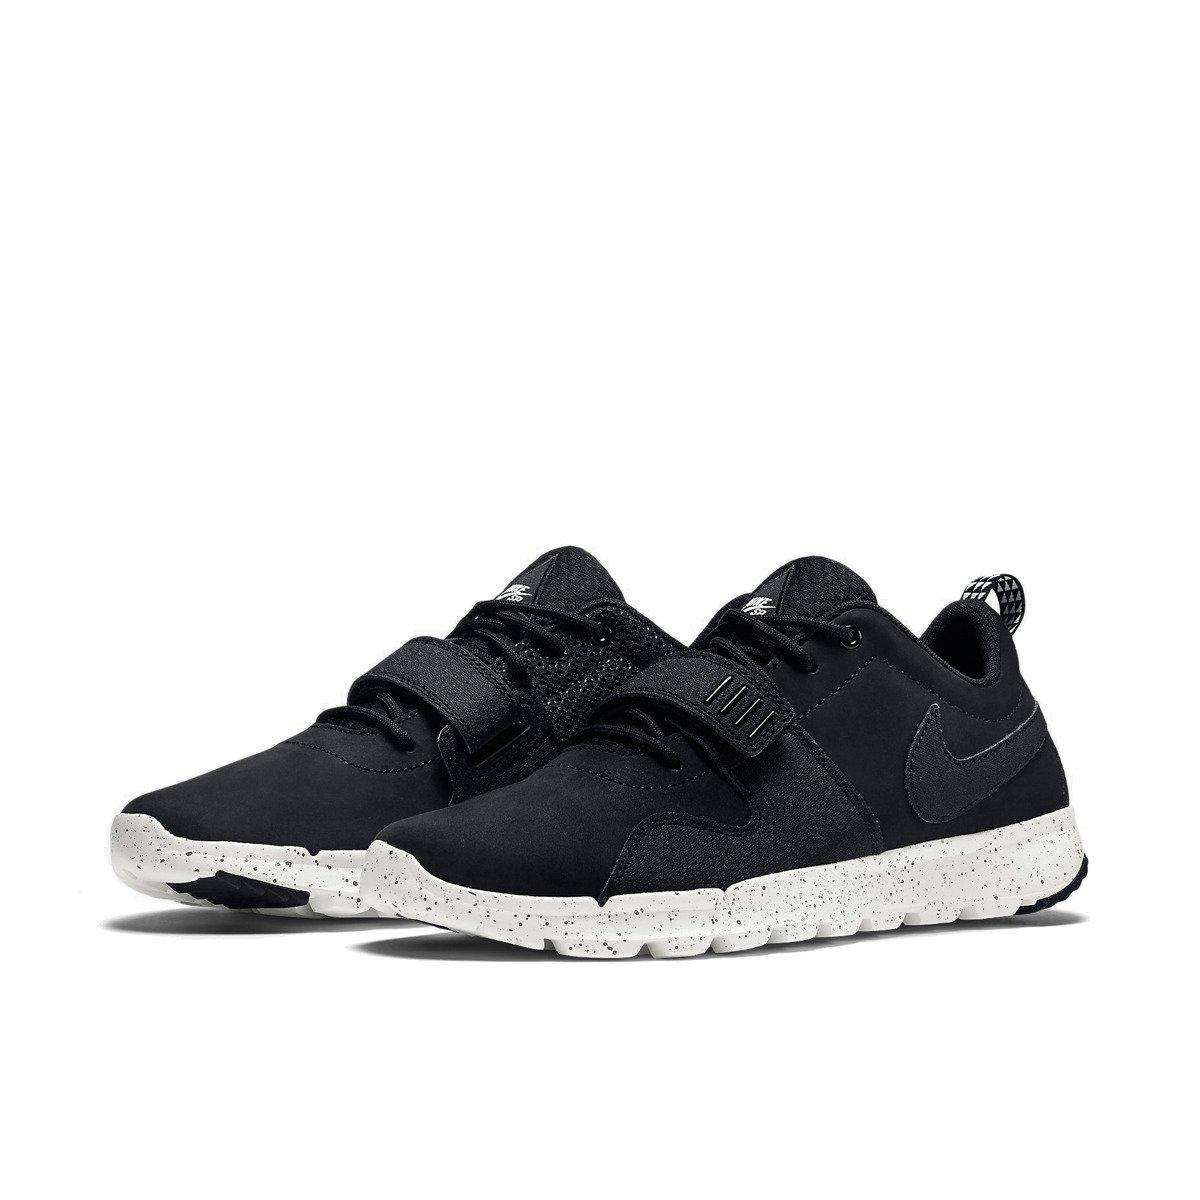 cc6c4f027d94 ... Buty Nike sb Trainerendor BLACK BLACK-BLACK Click to zoom ...